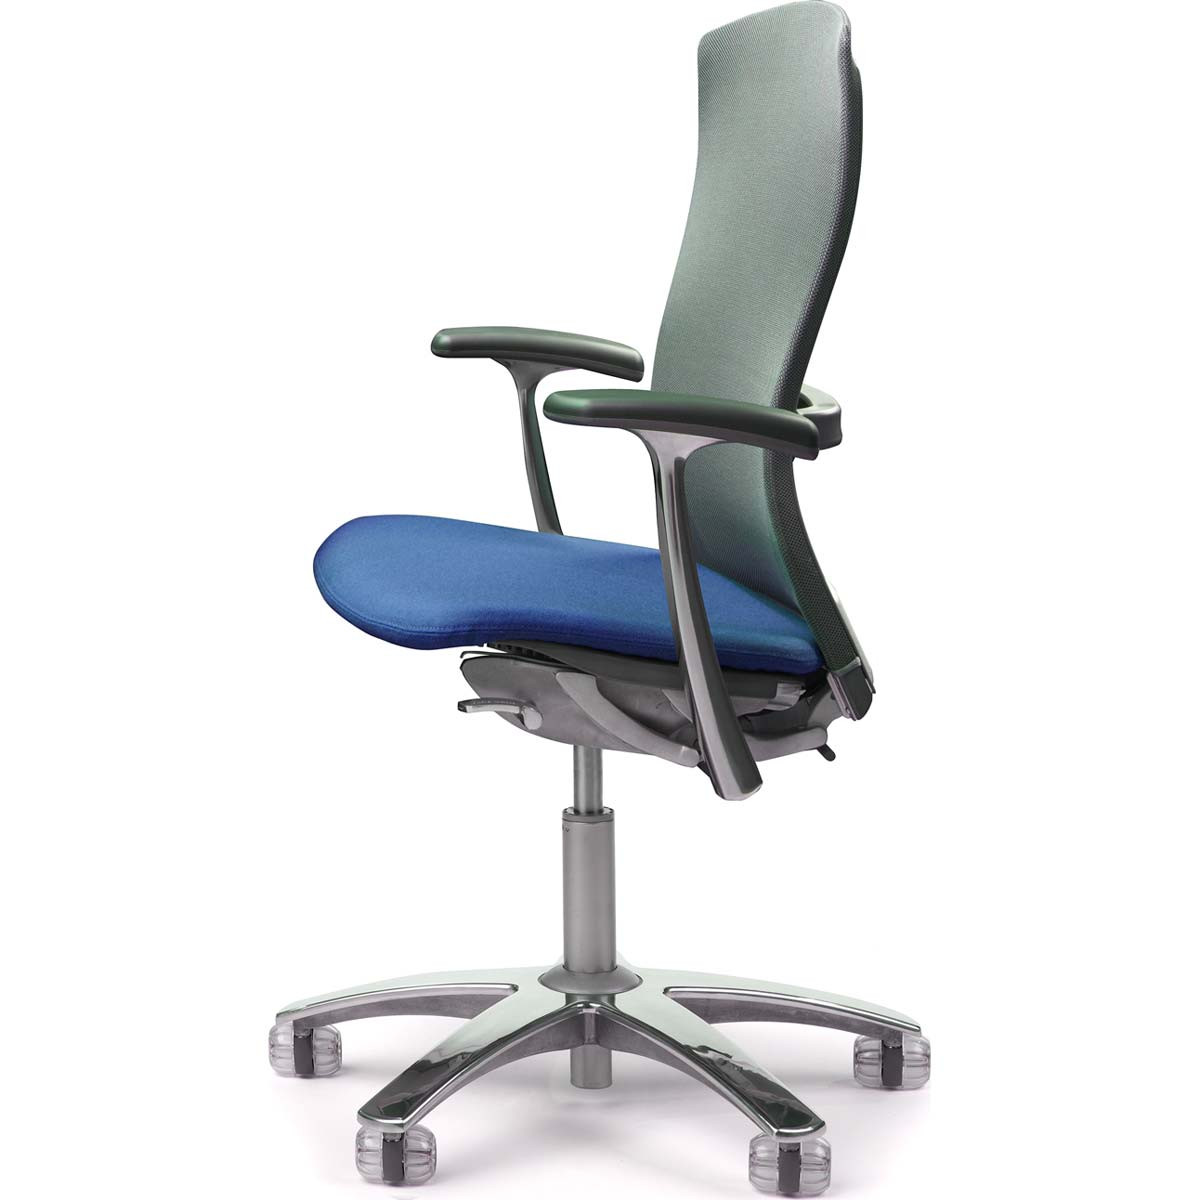 Knoll Life Chair. Loading Zoom. Knoll Life Chair